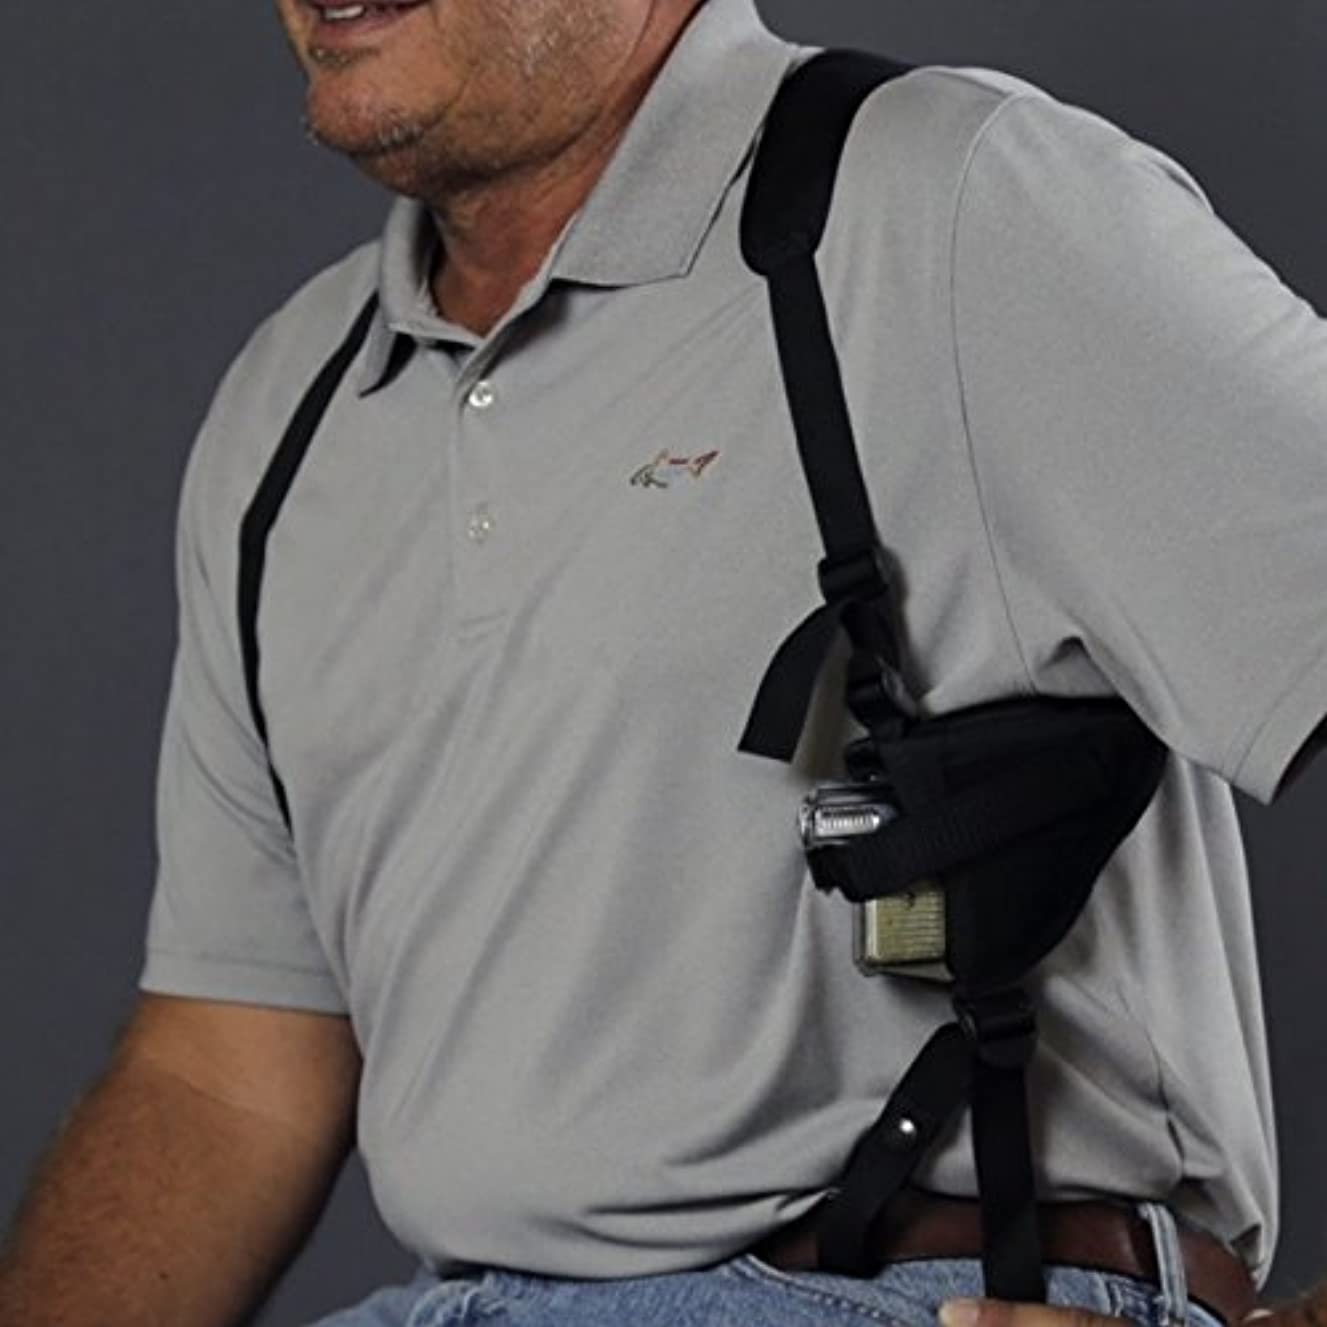 Gun Holster Shoulder TAURUS TH9C COMPACT PISTOL 1-TH9C031 3.54